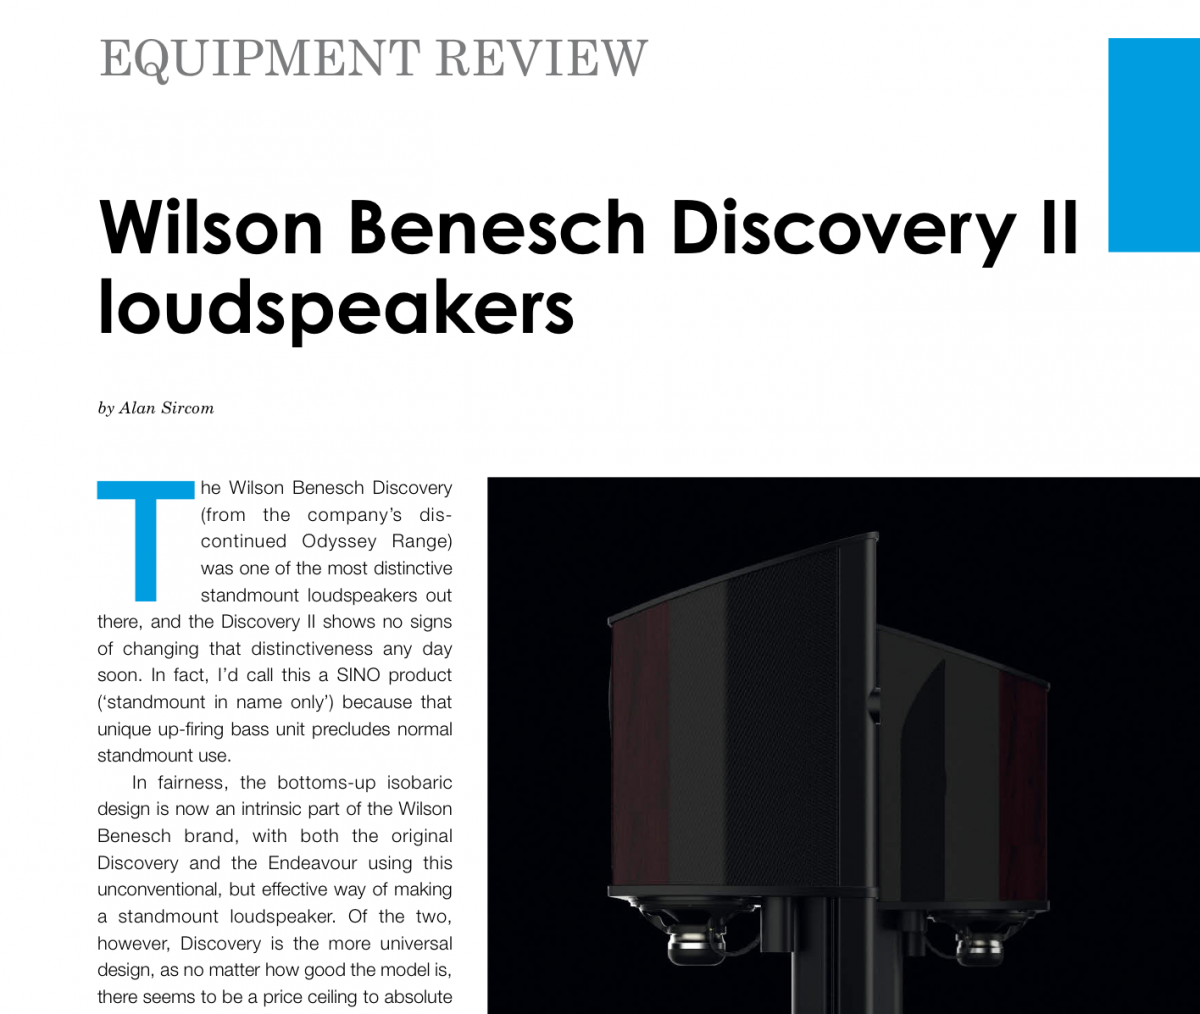 Hifi Plus test Wilson Benesch Discovery II